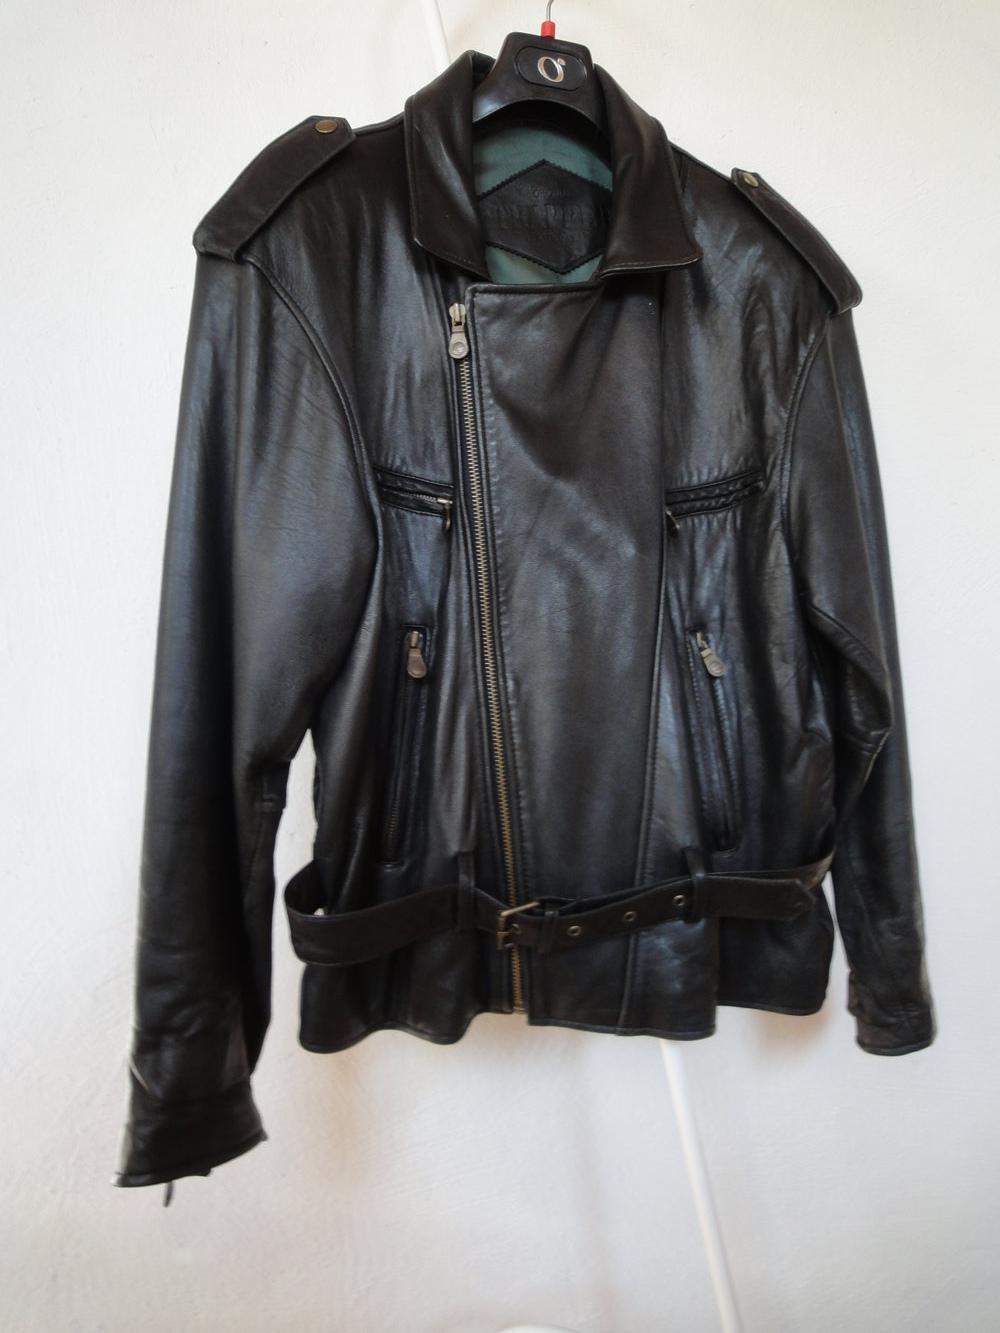 Trapper leather wear Herren Lederjacke 52 :: Kleiderkorb.at